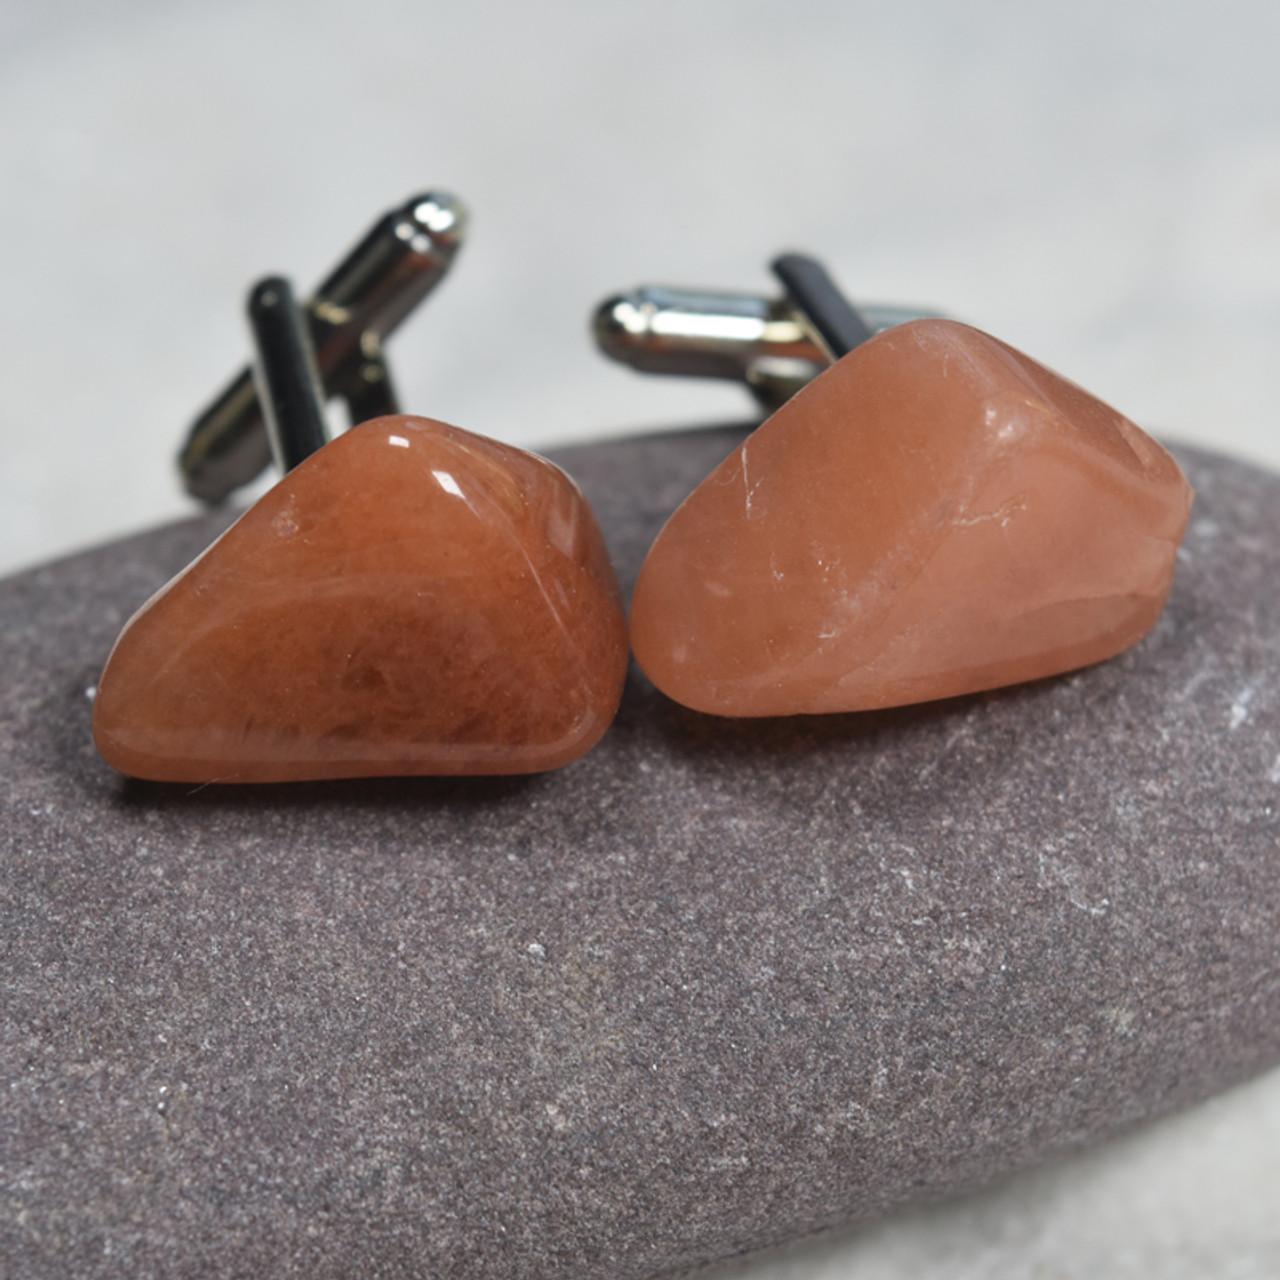 Tumbled Peach Quartz Cufflinks